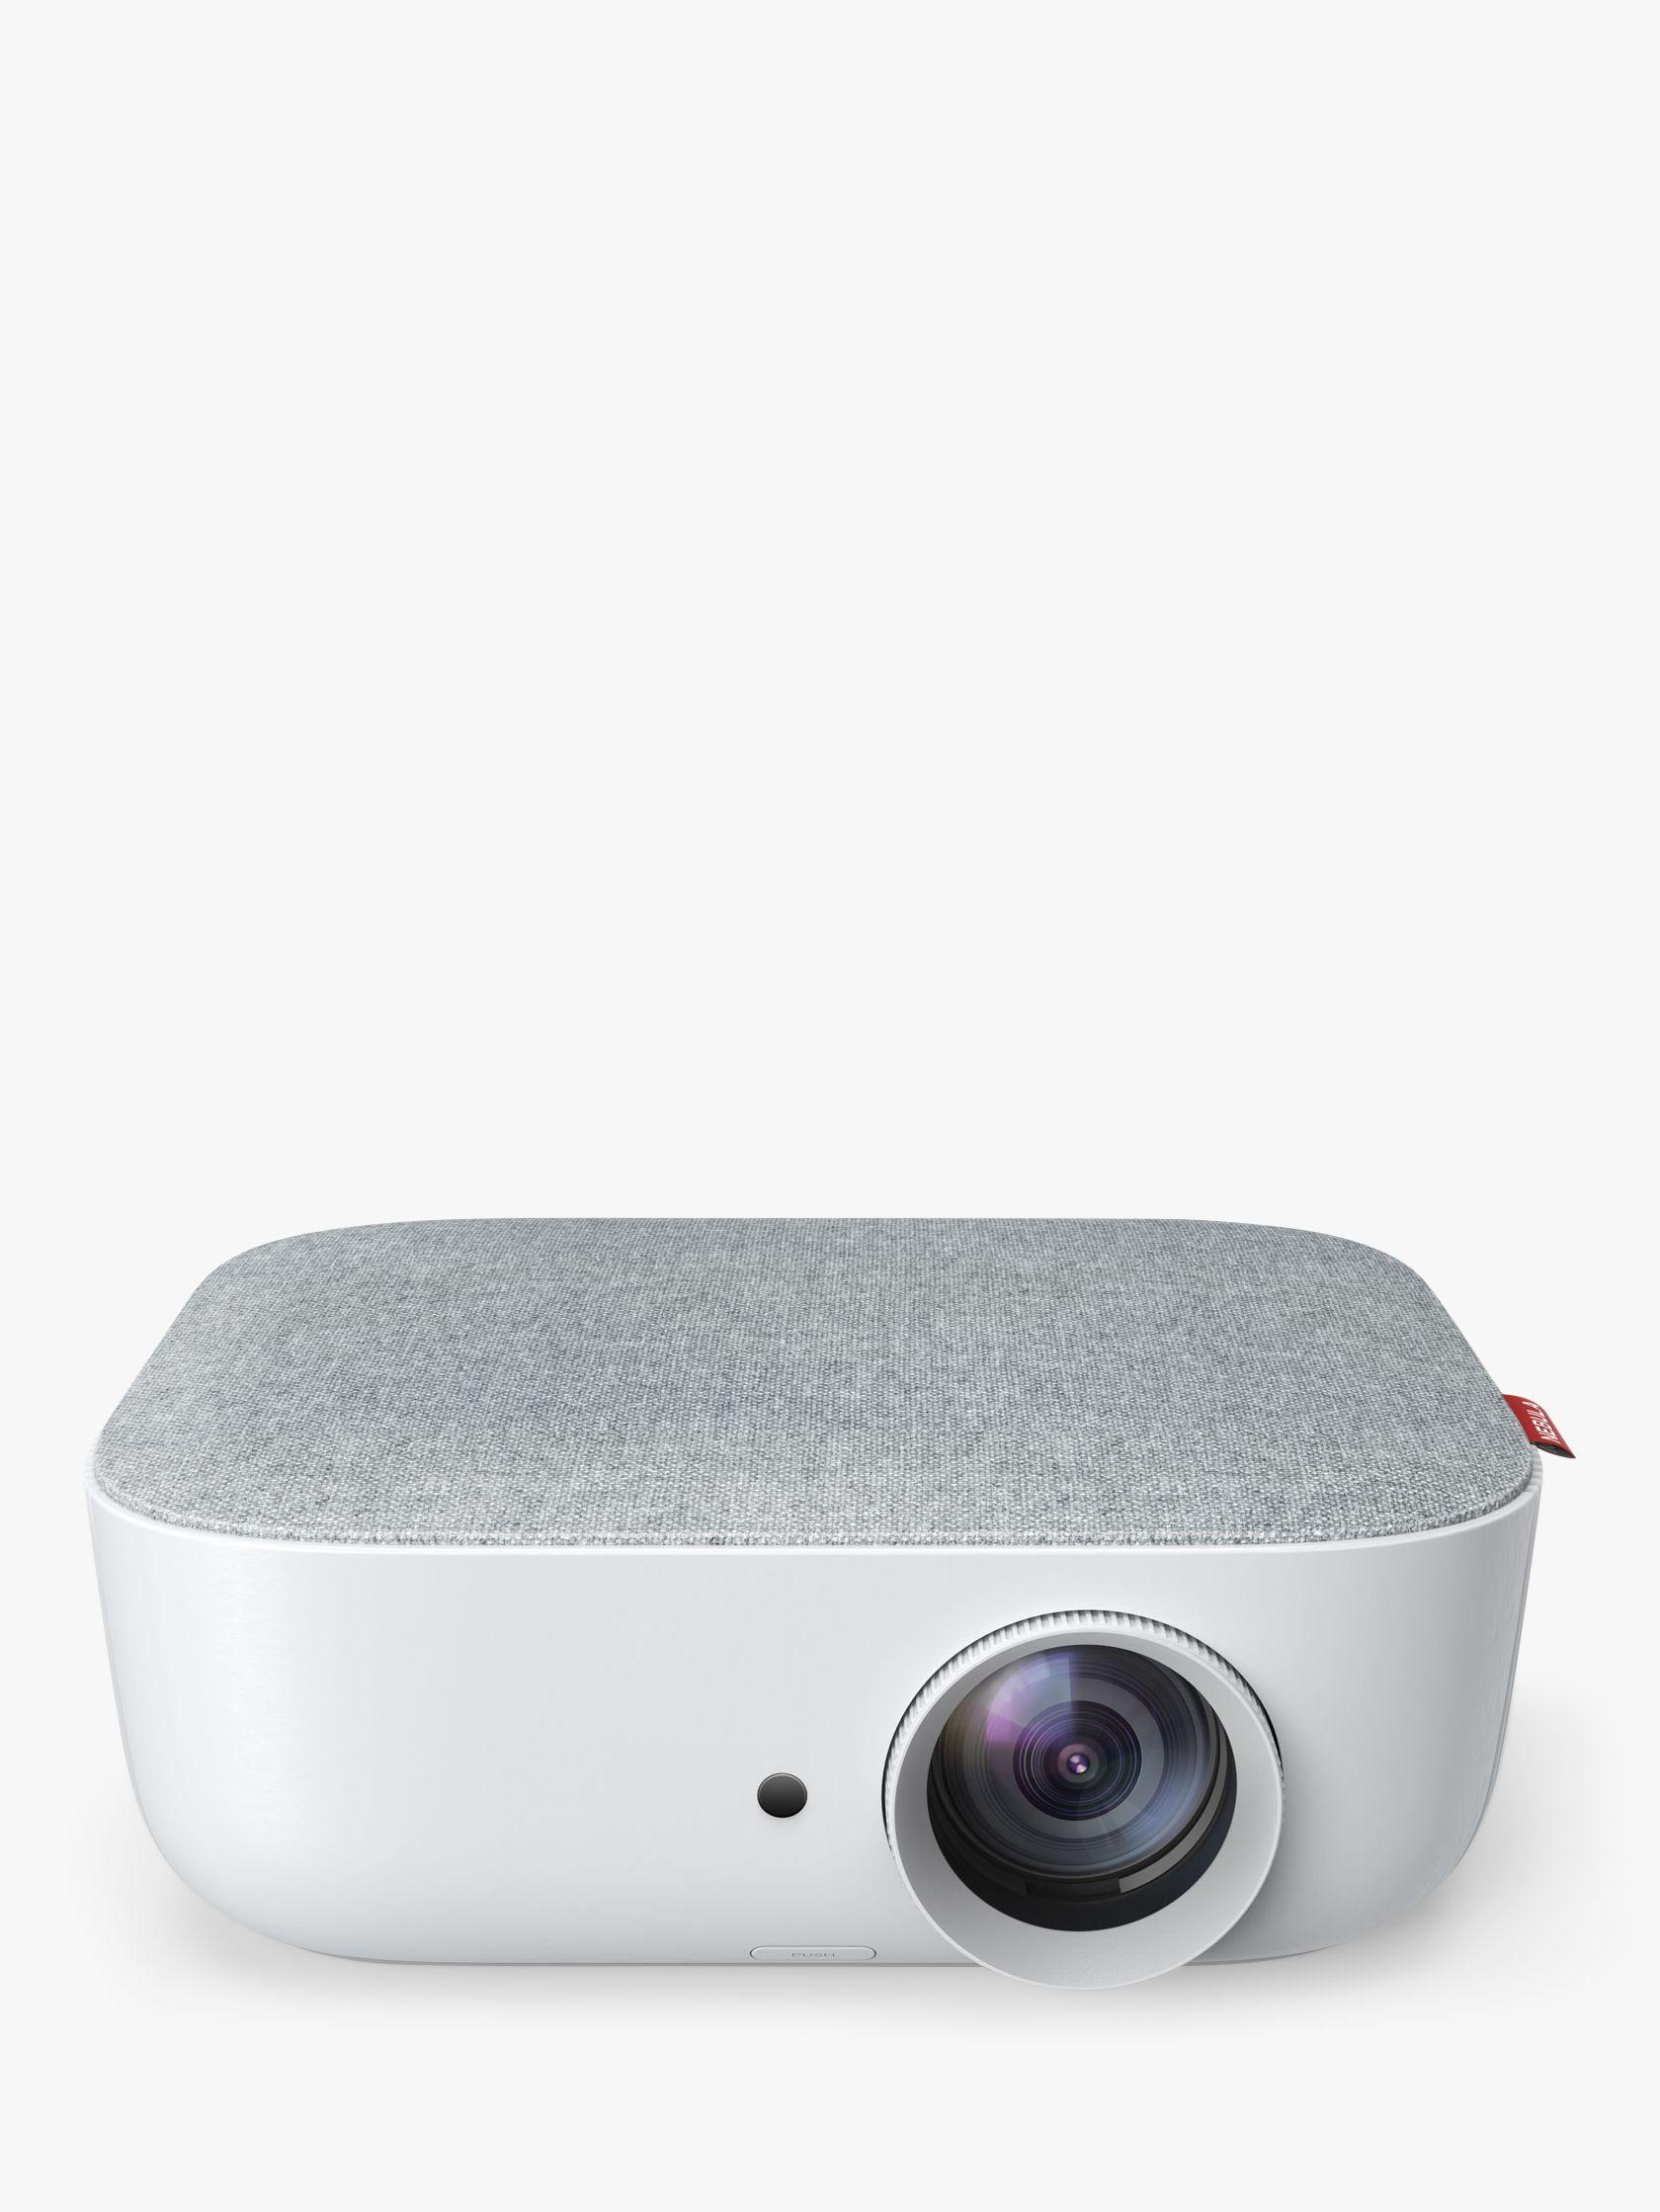 Nebula Prizm 480p Resolution Projector 100 Lumens White Grey Projector Nebula Smart Device